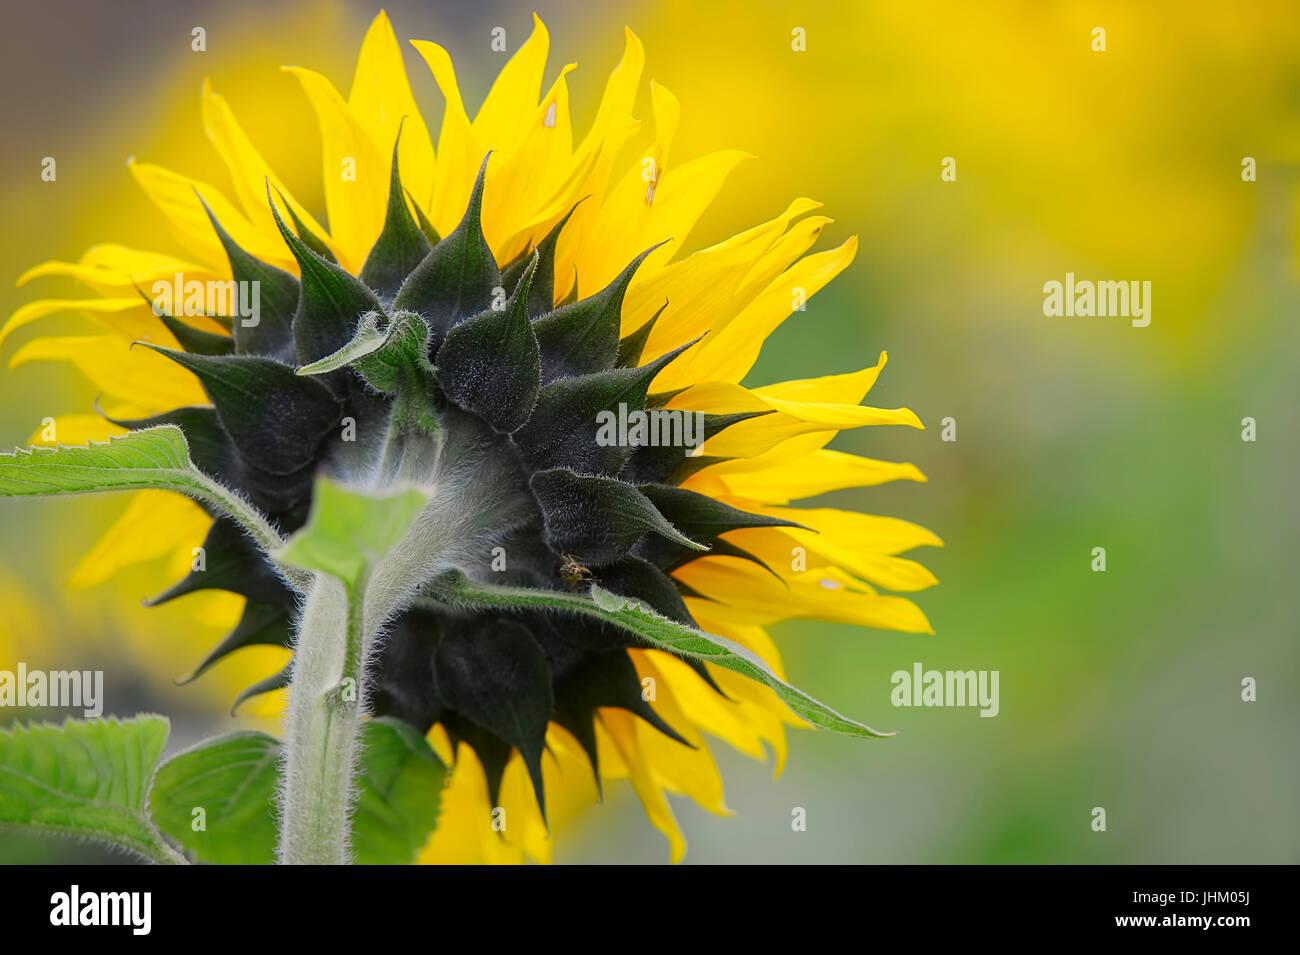 Sunflower, North Rhine-Westphalia, Germany / (Helianthus annuus)   Sonnenblume / (Helianthus annuus) - Stock Image